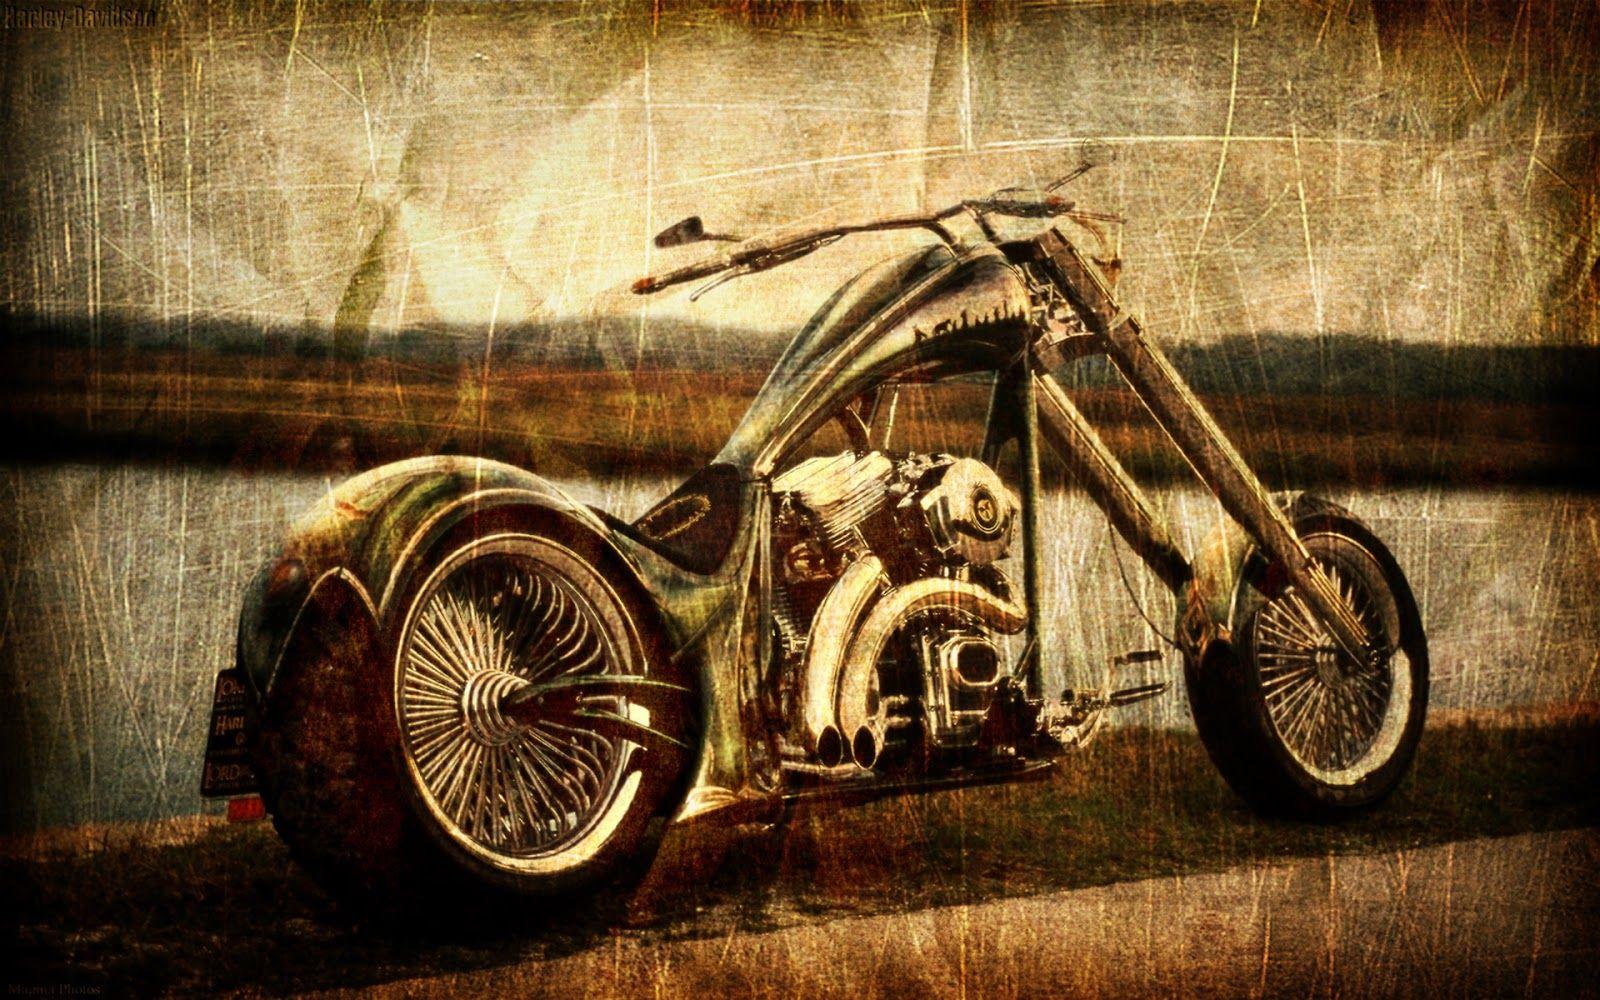 Vintage Boats Desktop Wallpapers Vintage Chopper Wallpaper Best Hd Wallpapers Motorcycle Wallpaper Classic Motorcycles Beautiful Bike